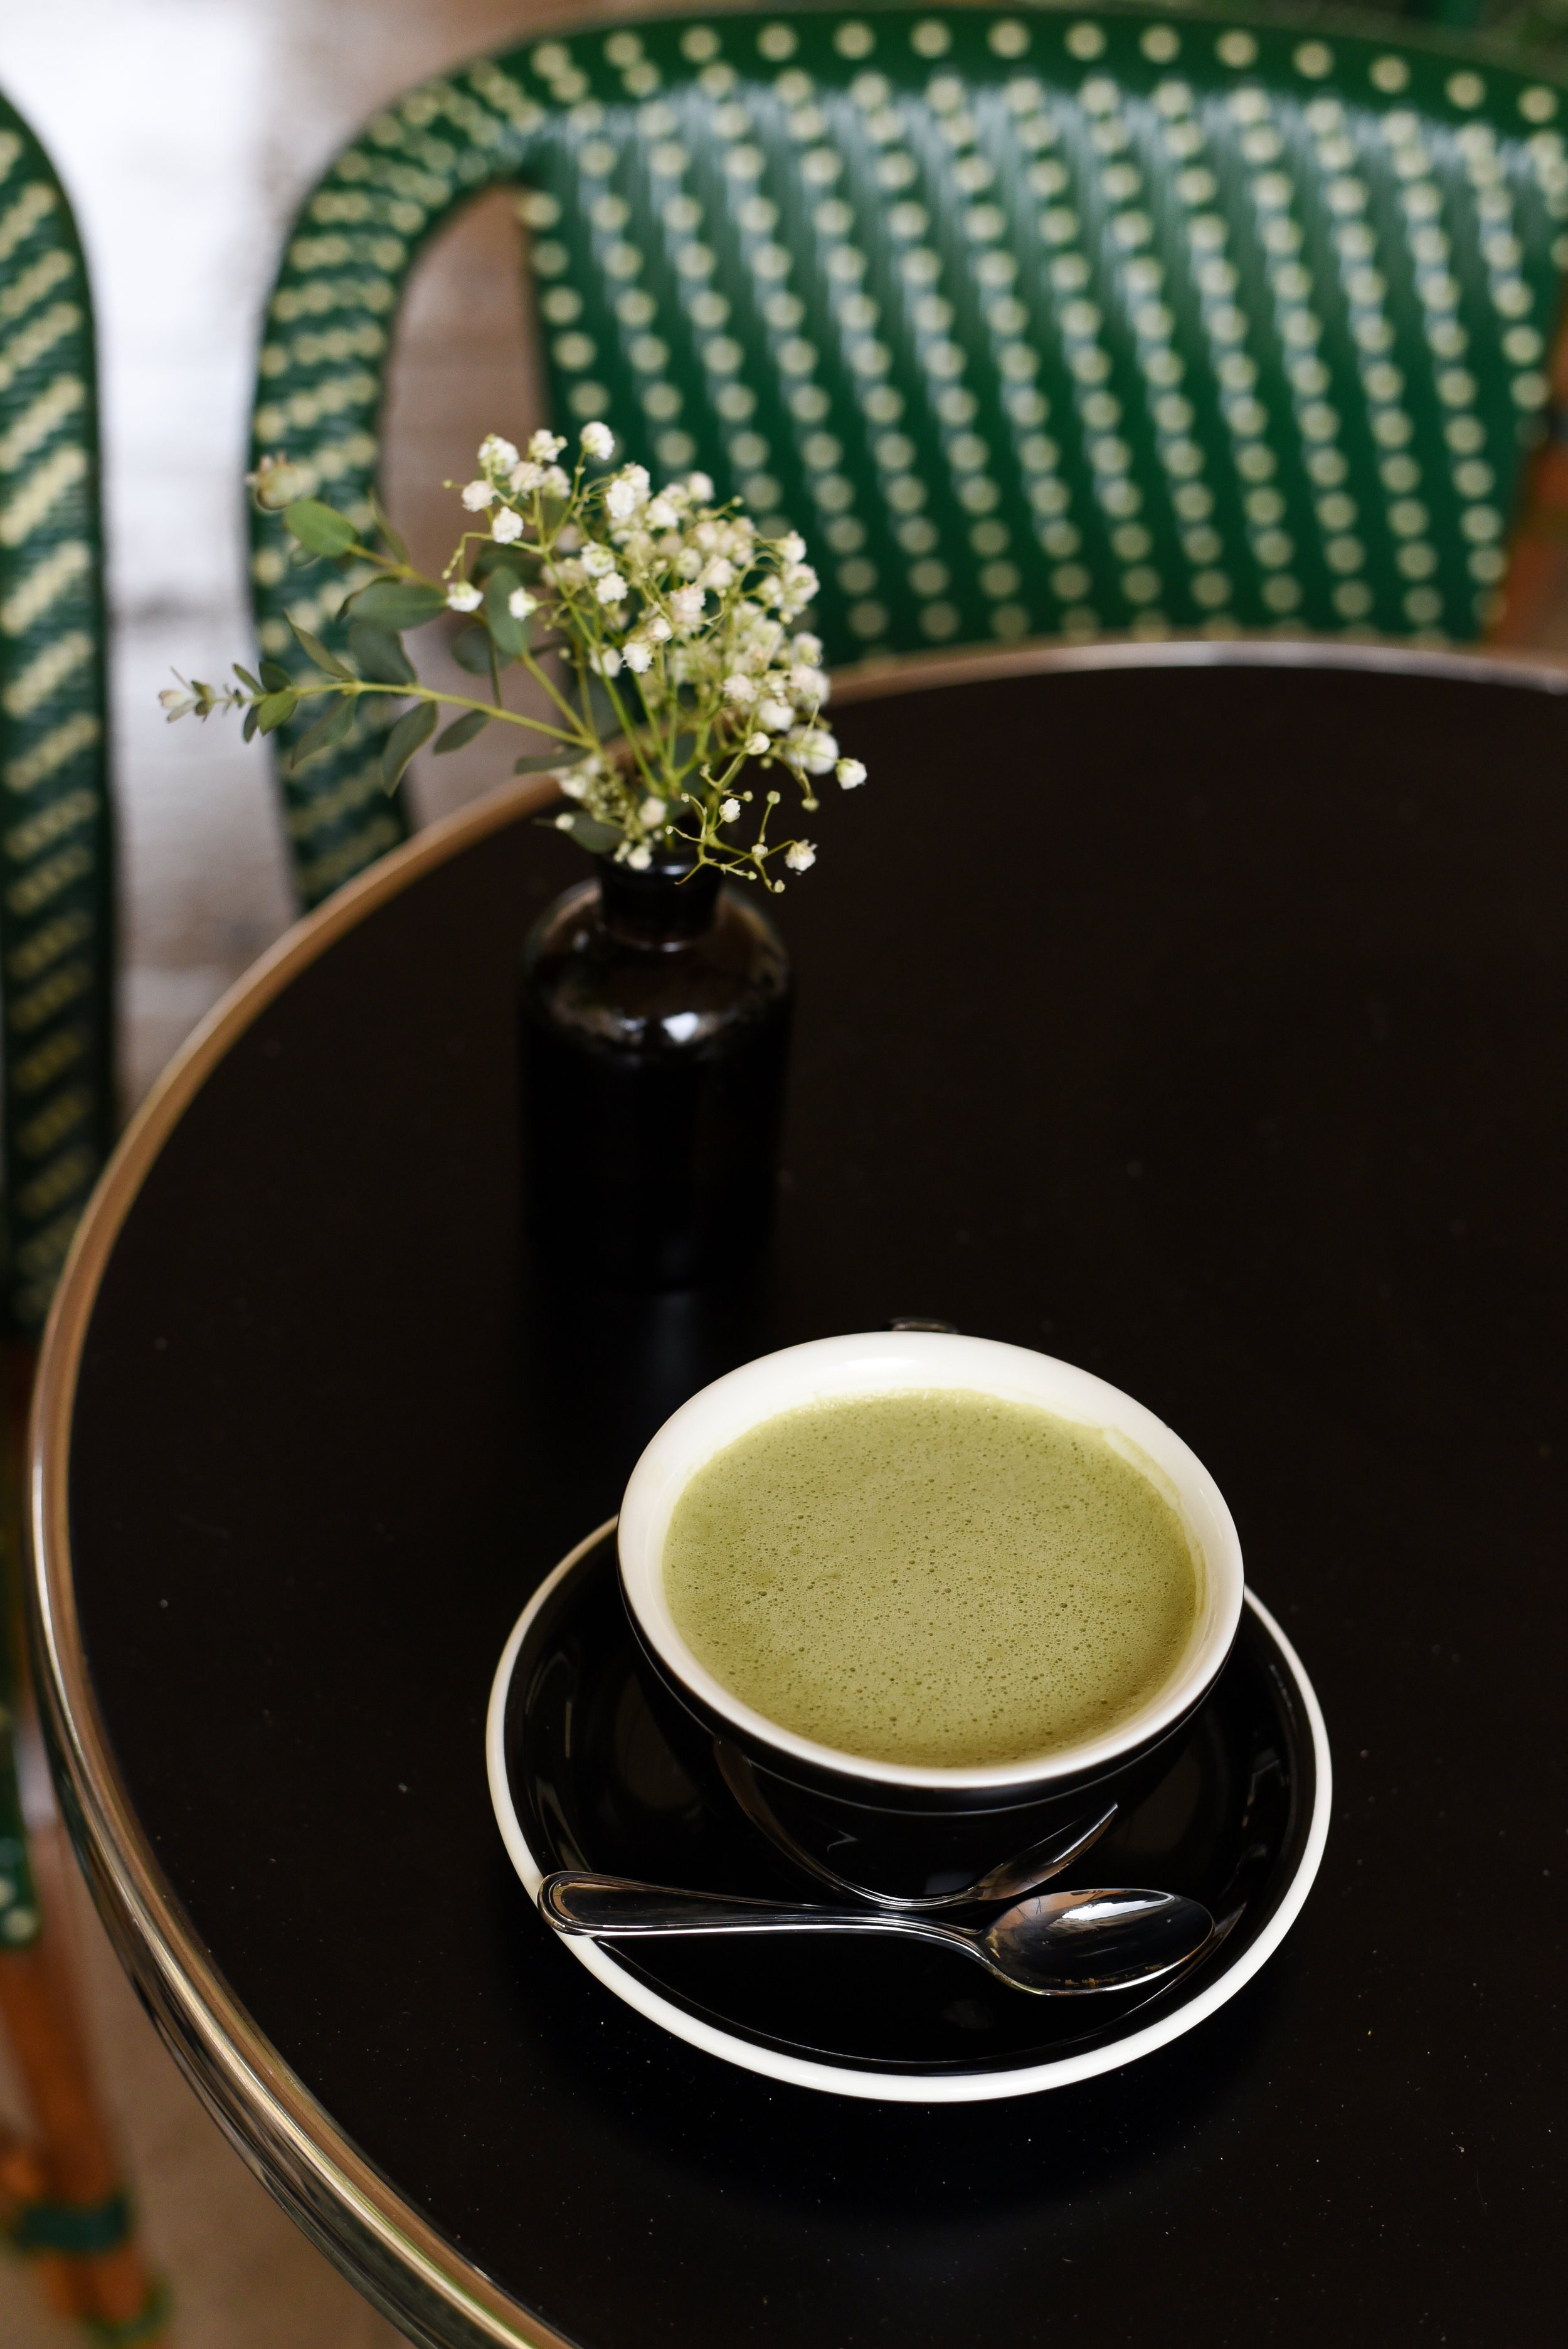 twinky-lizzy-blog-aix-en-provence-cafe-du-temps-restaurant-vegan-6.jpg